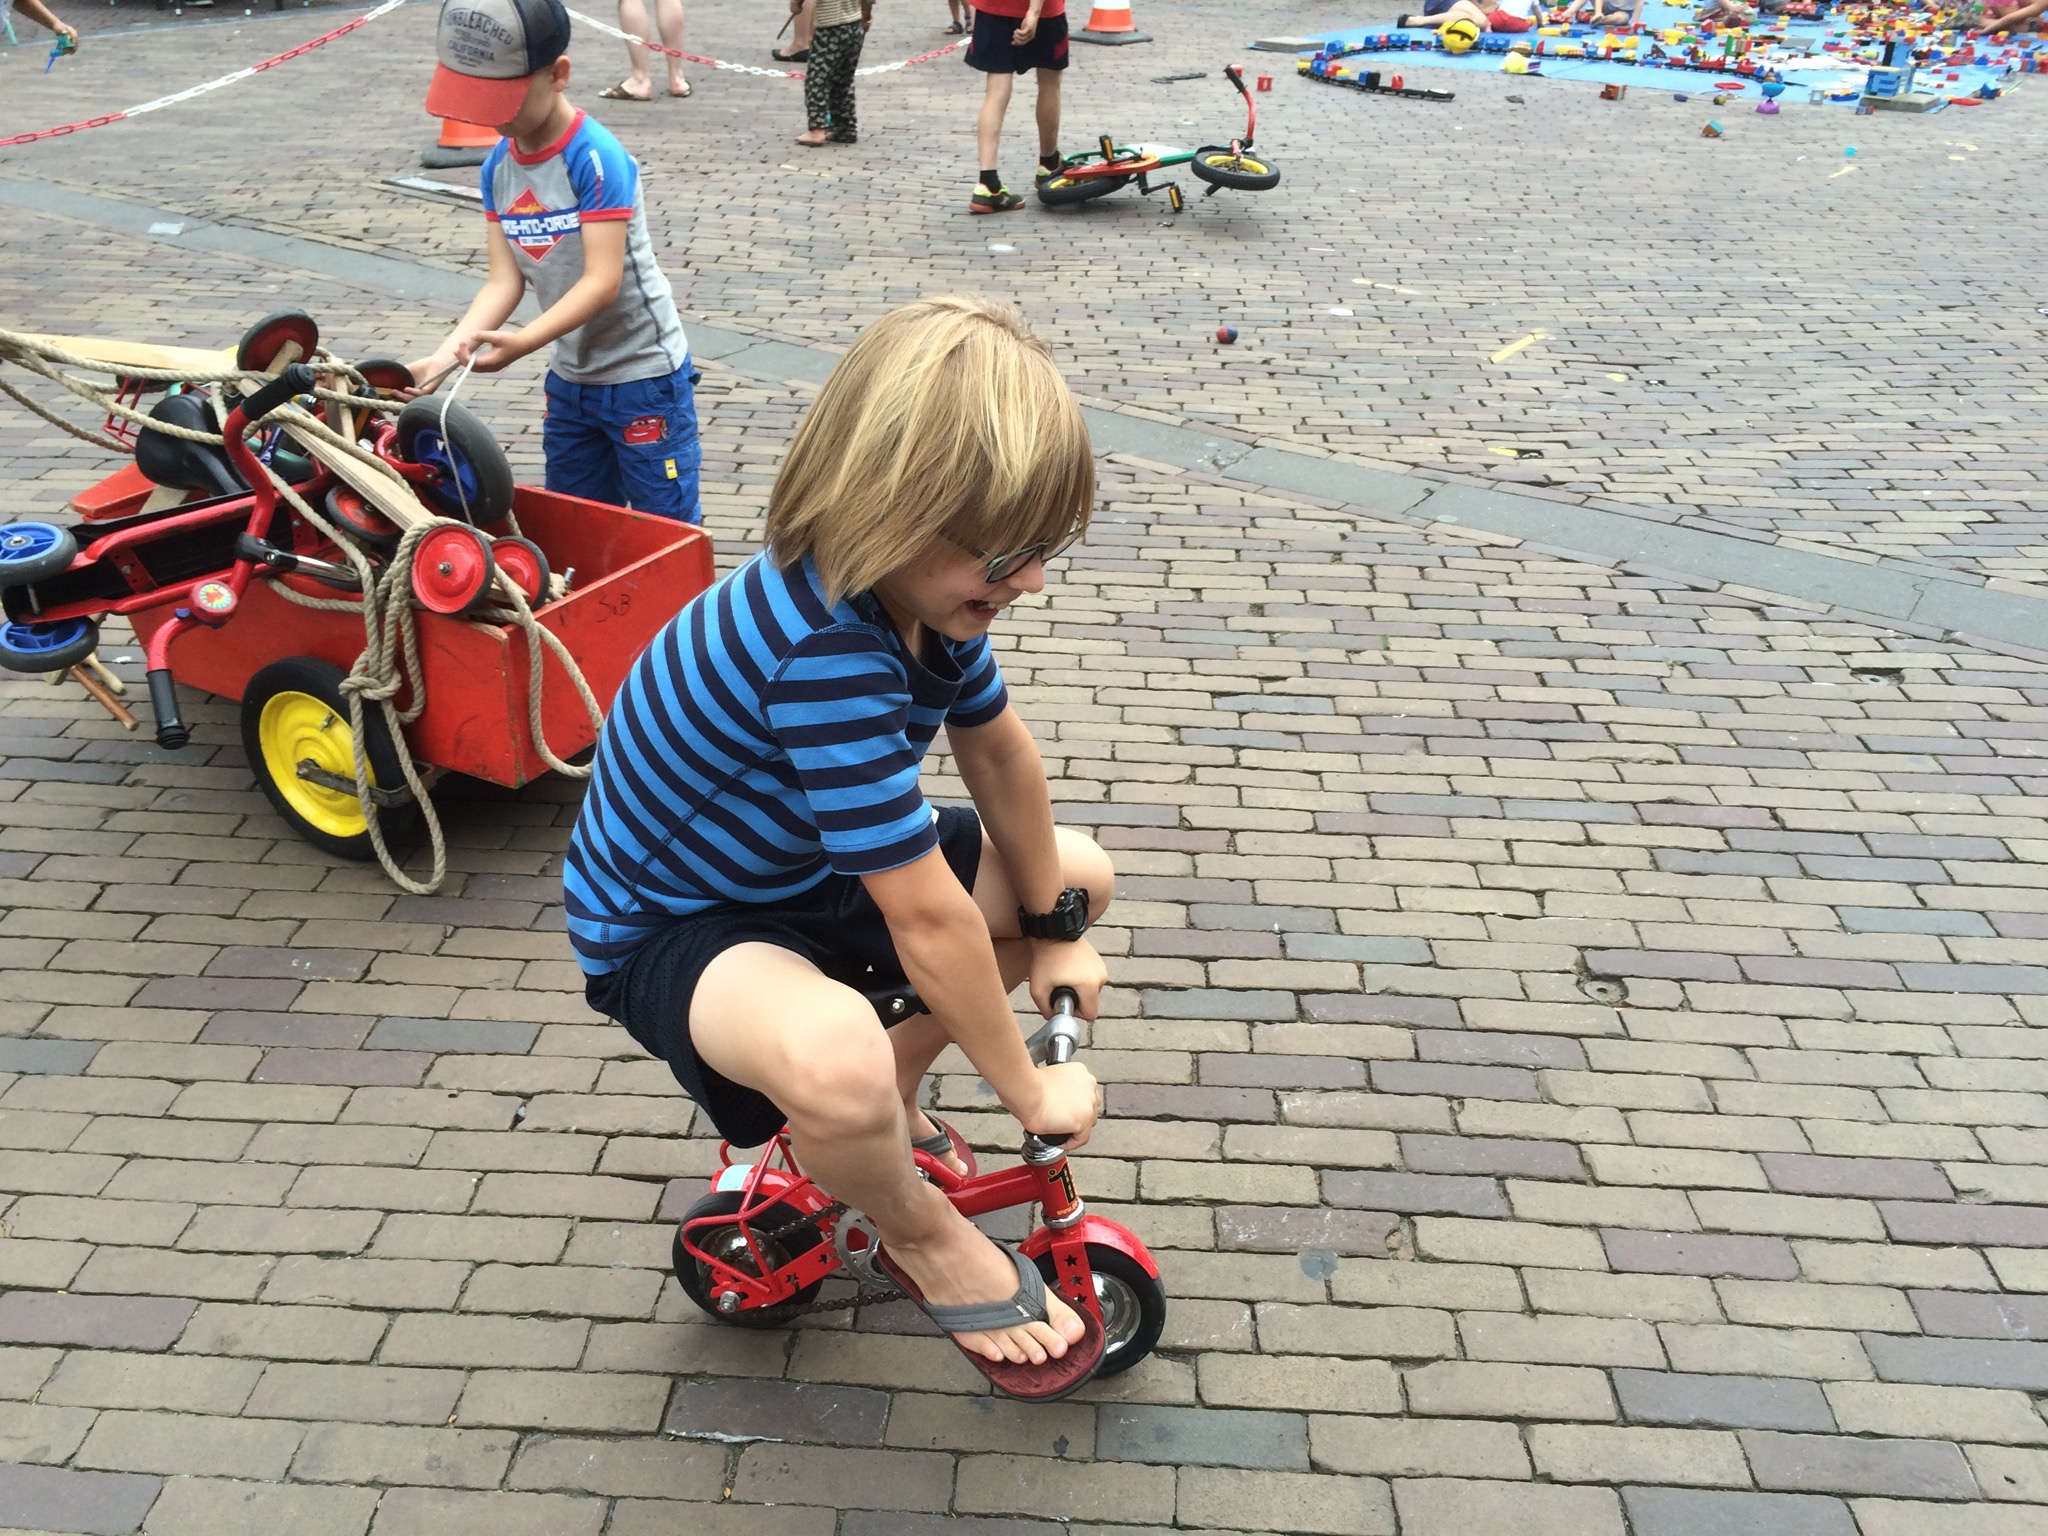 Elliot rides a tiny bike. Deventer, Netherlands.